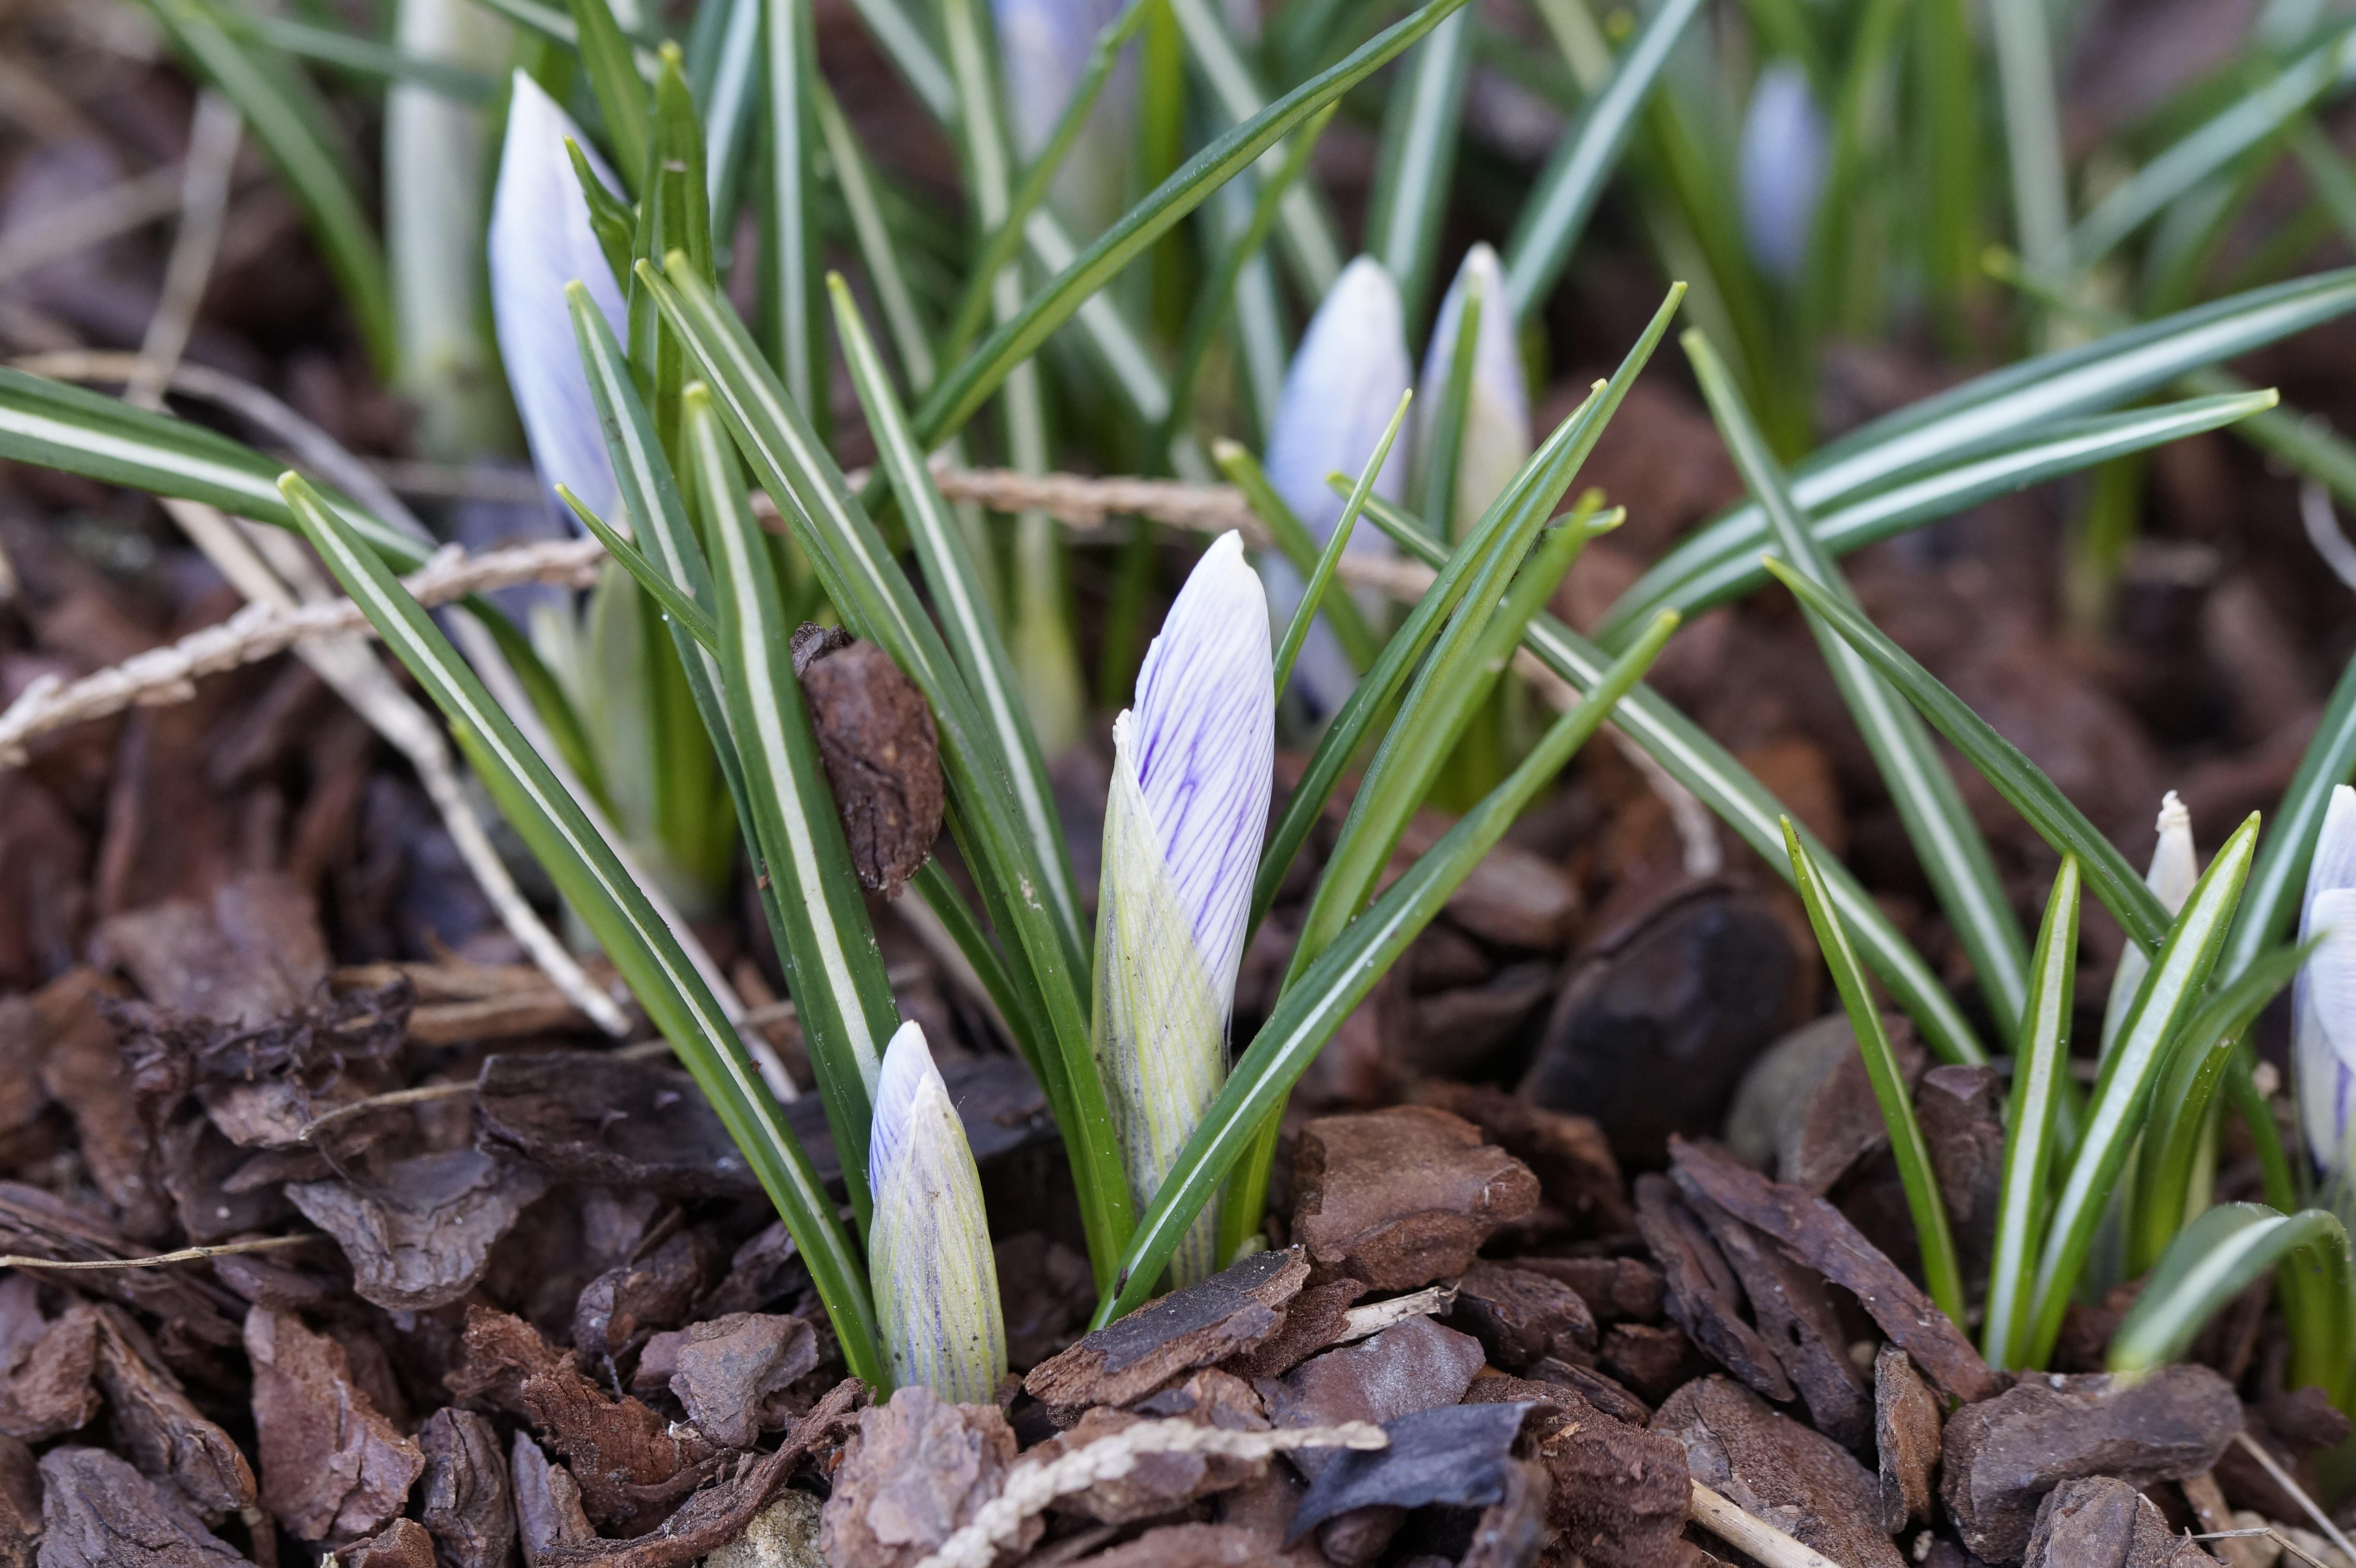 free images nature blossom purple bloom herb soil botany